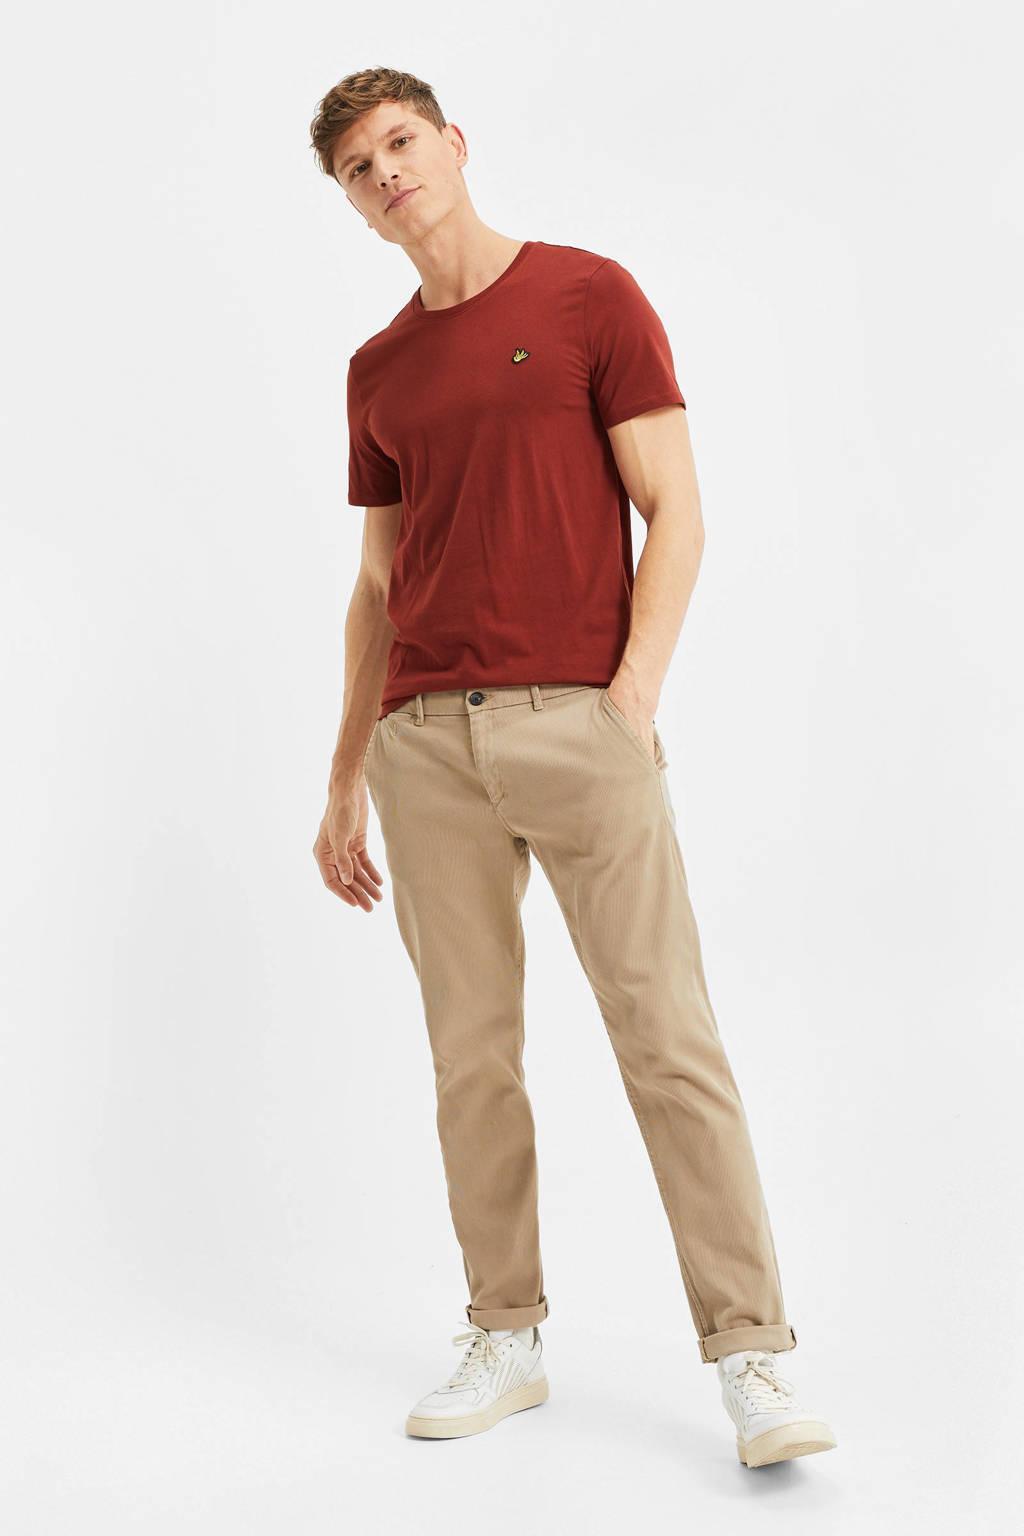 WE Fashion T-shirt van biologisch katoen donkerrood, Donkerrood